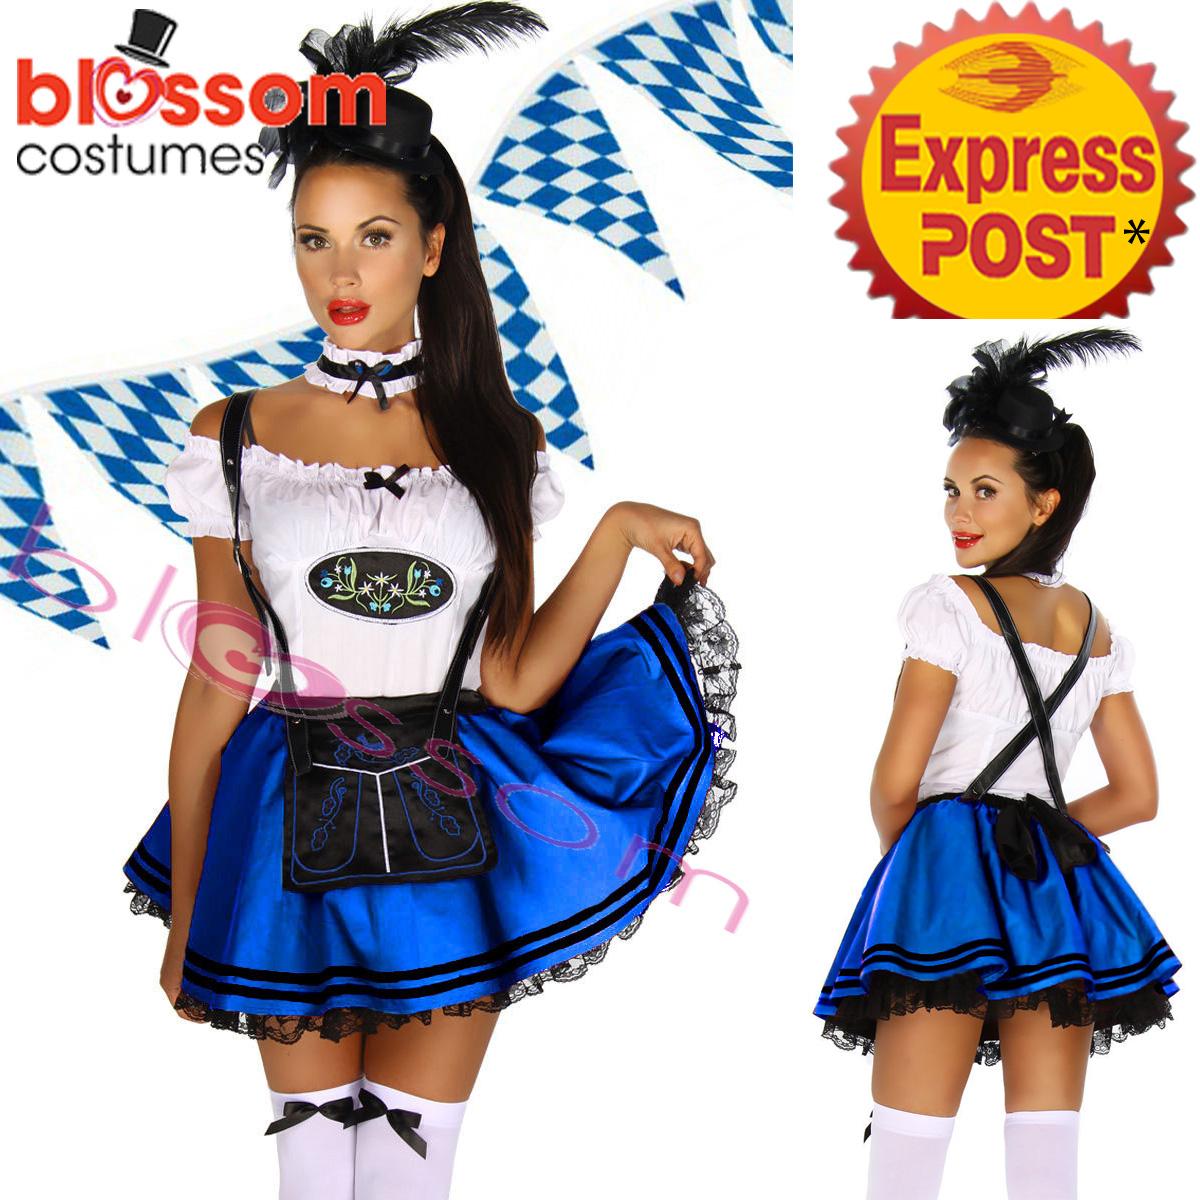 E45-Blue-Oktoberfest-Costume-Dress-Up-German-Heidi-Dirdnl-Leiderhosen-Beer-Maid